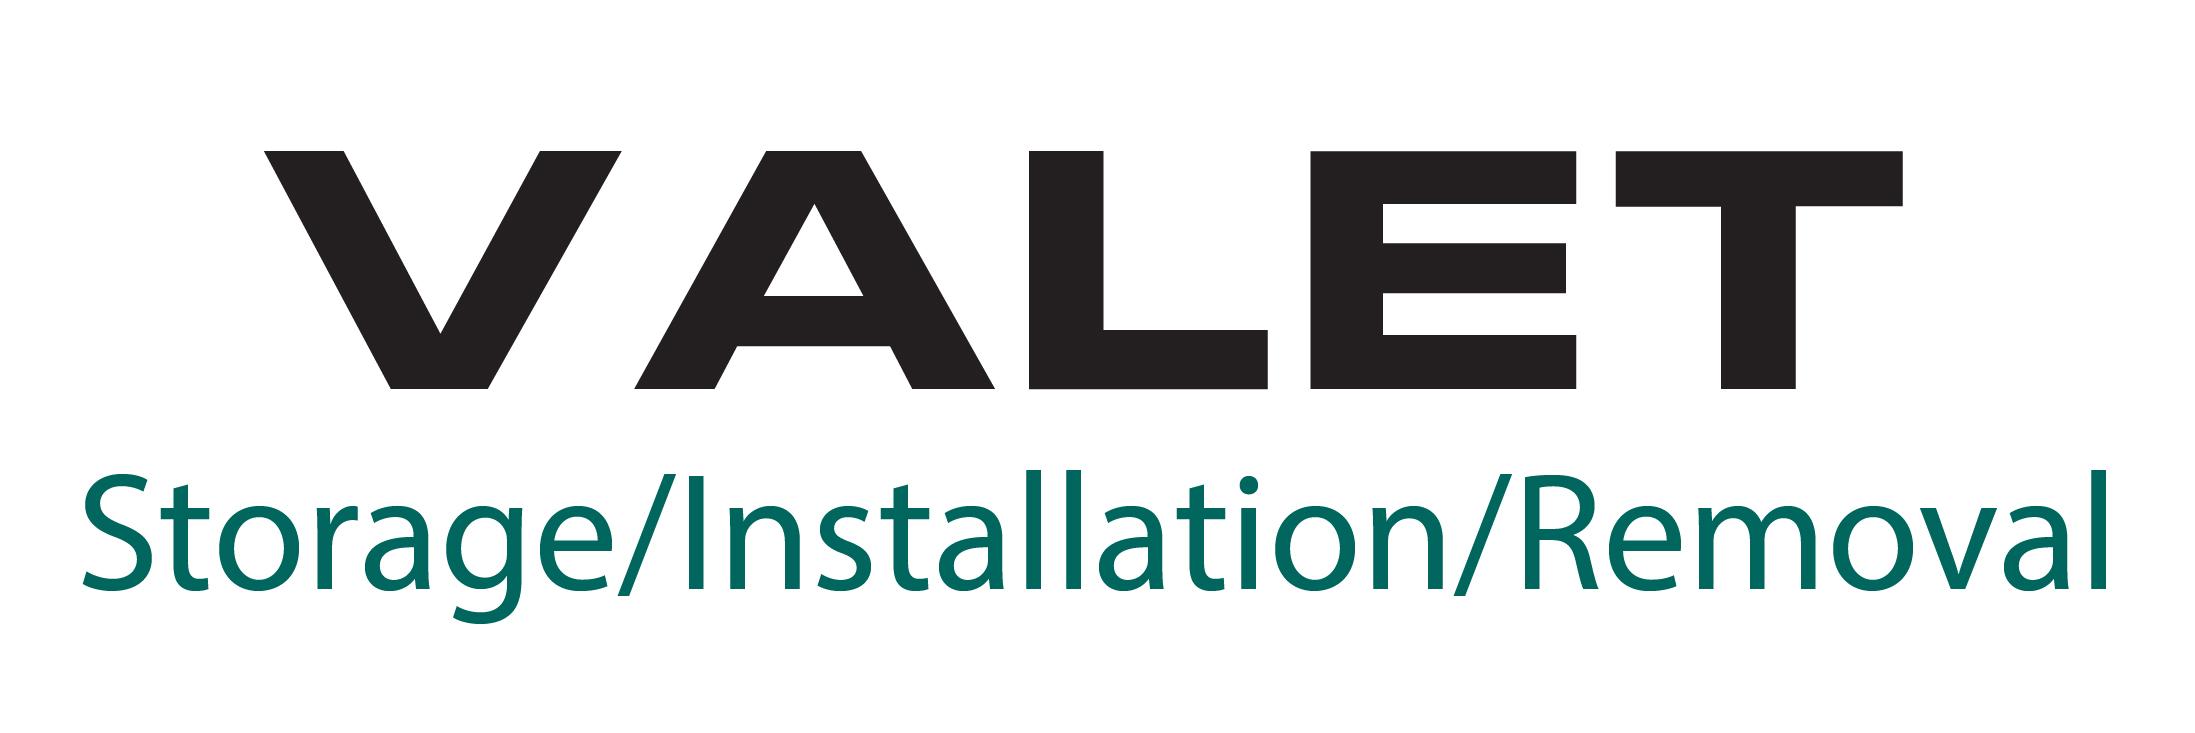 valet-logo-01-07.jpg